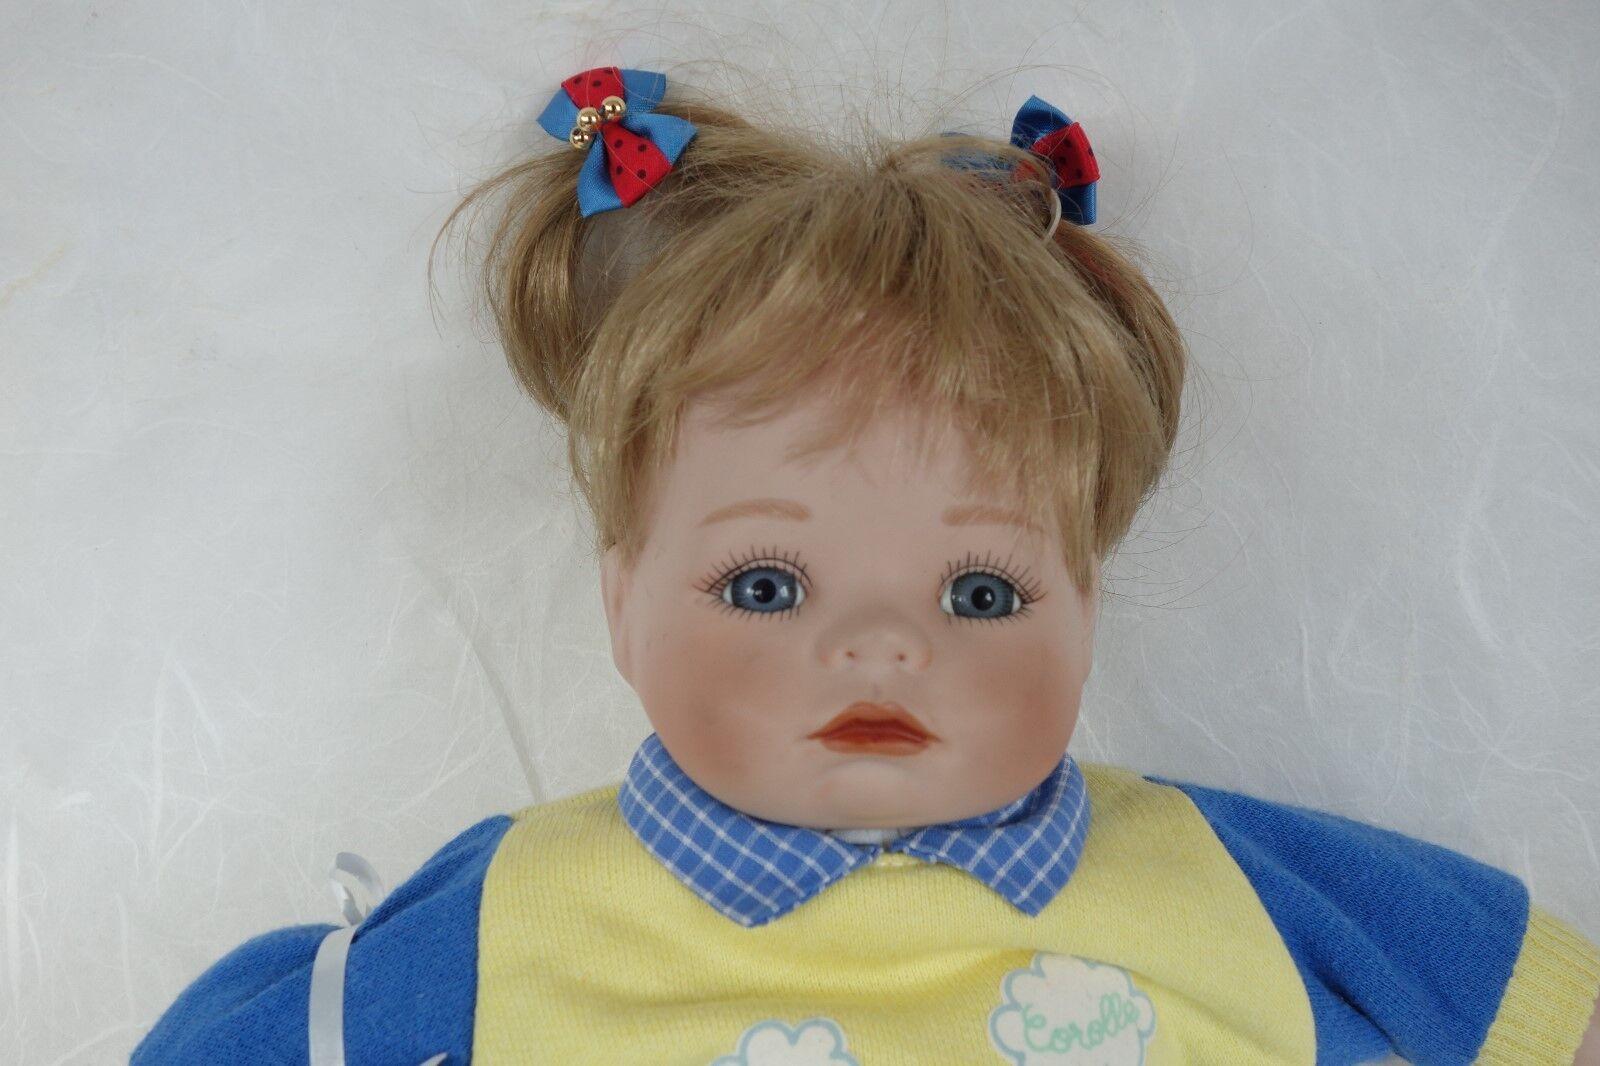 Puppe Hannah 1992 35 cm Künstlerpuppe Porzellanpuppe Deko